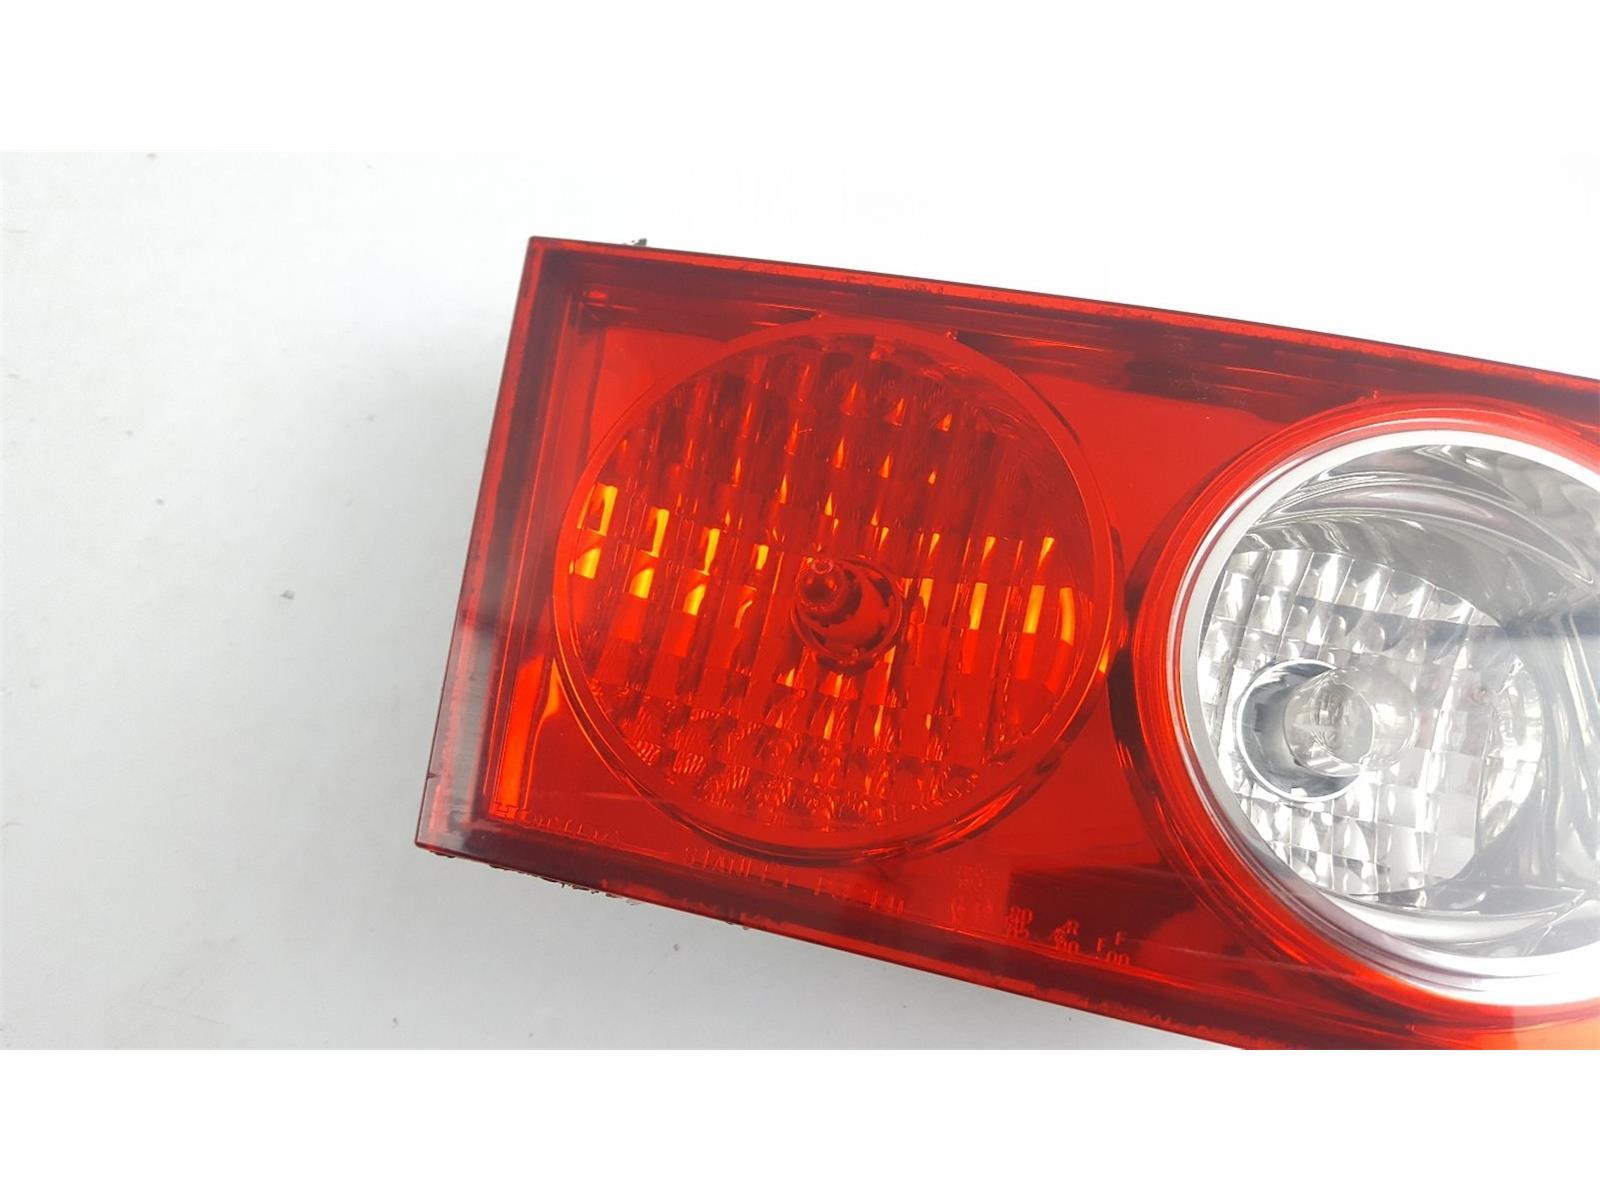 Honda Accord 2003 To 2005 Lamp Assembly Rear Lh Petrol Manual Tail Light Mk6 Inner Ns Passenger 34156sea003